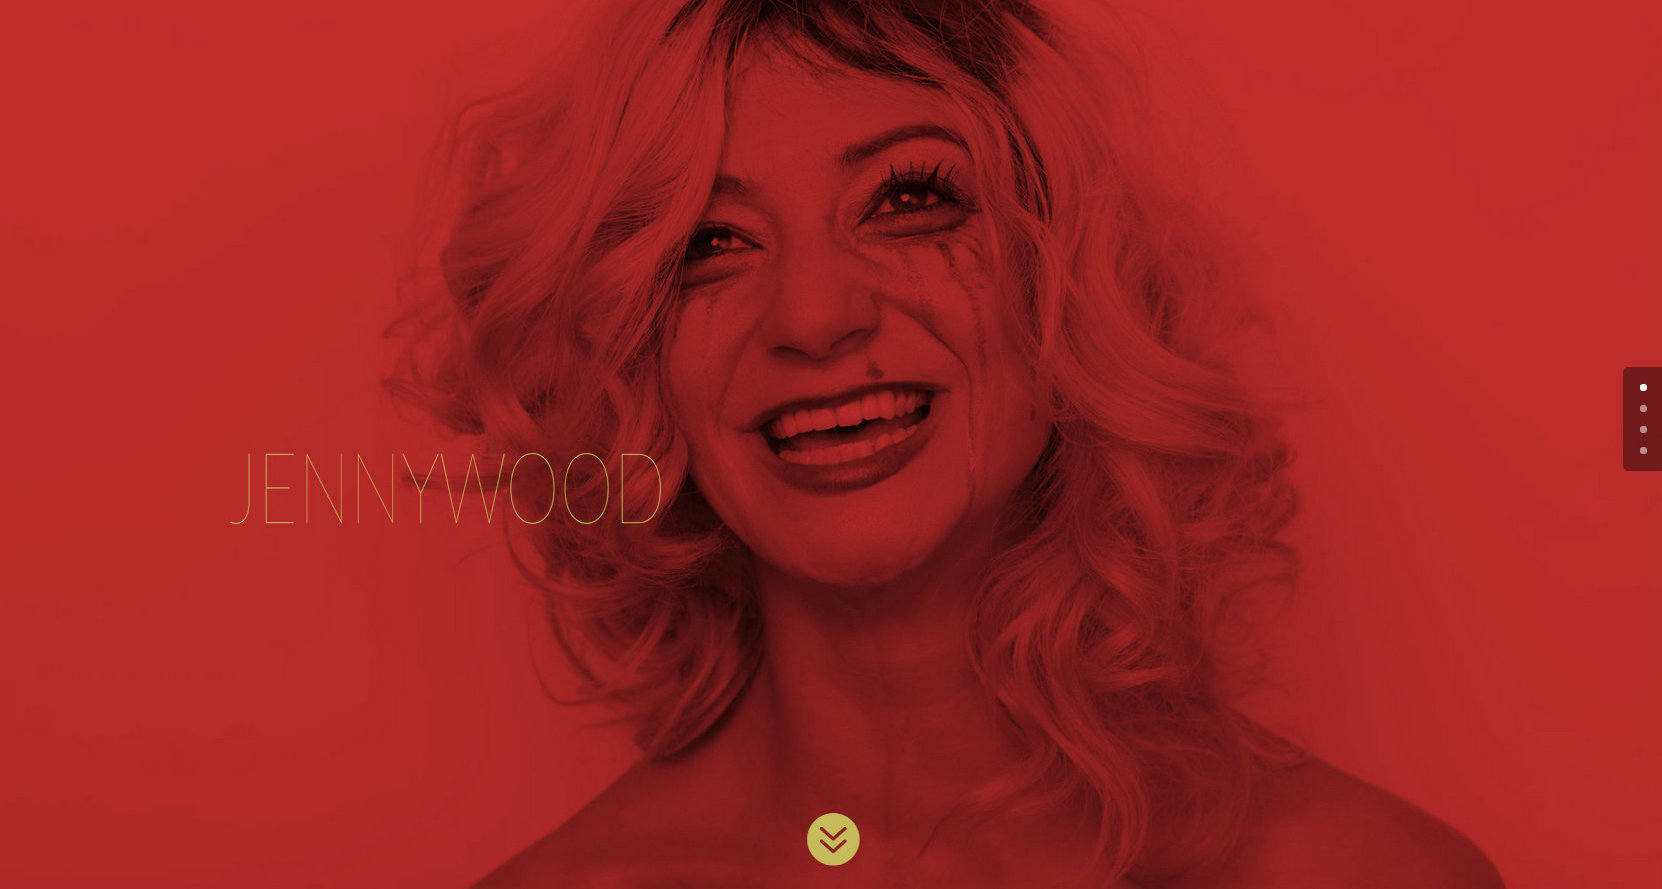 Wichita Musician Jenny Wood Website Design